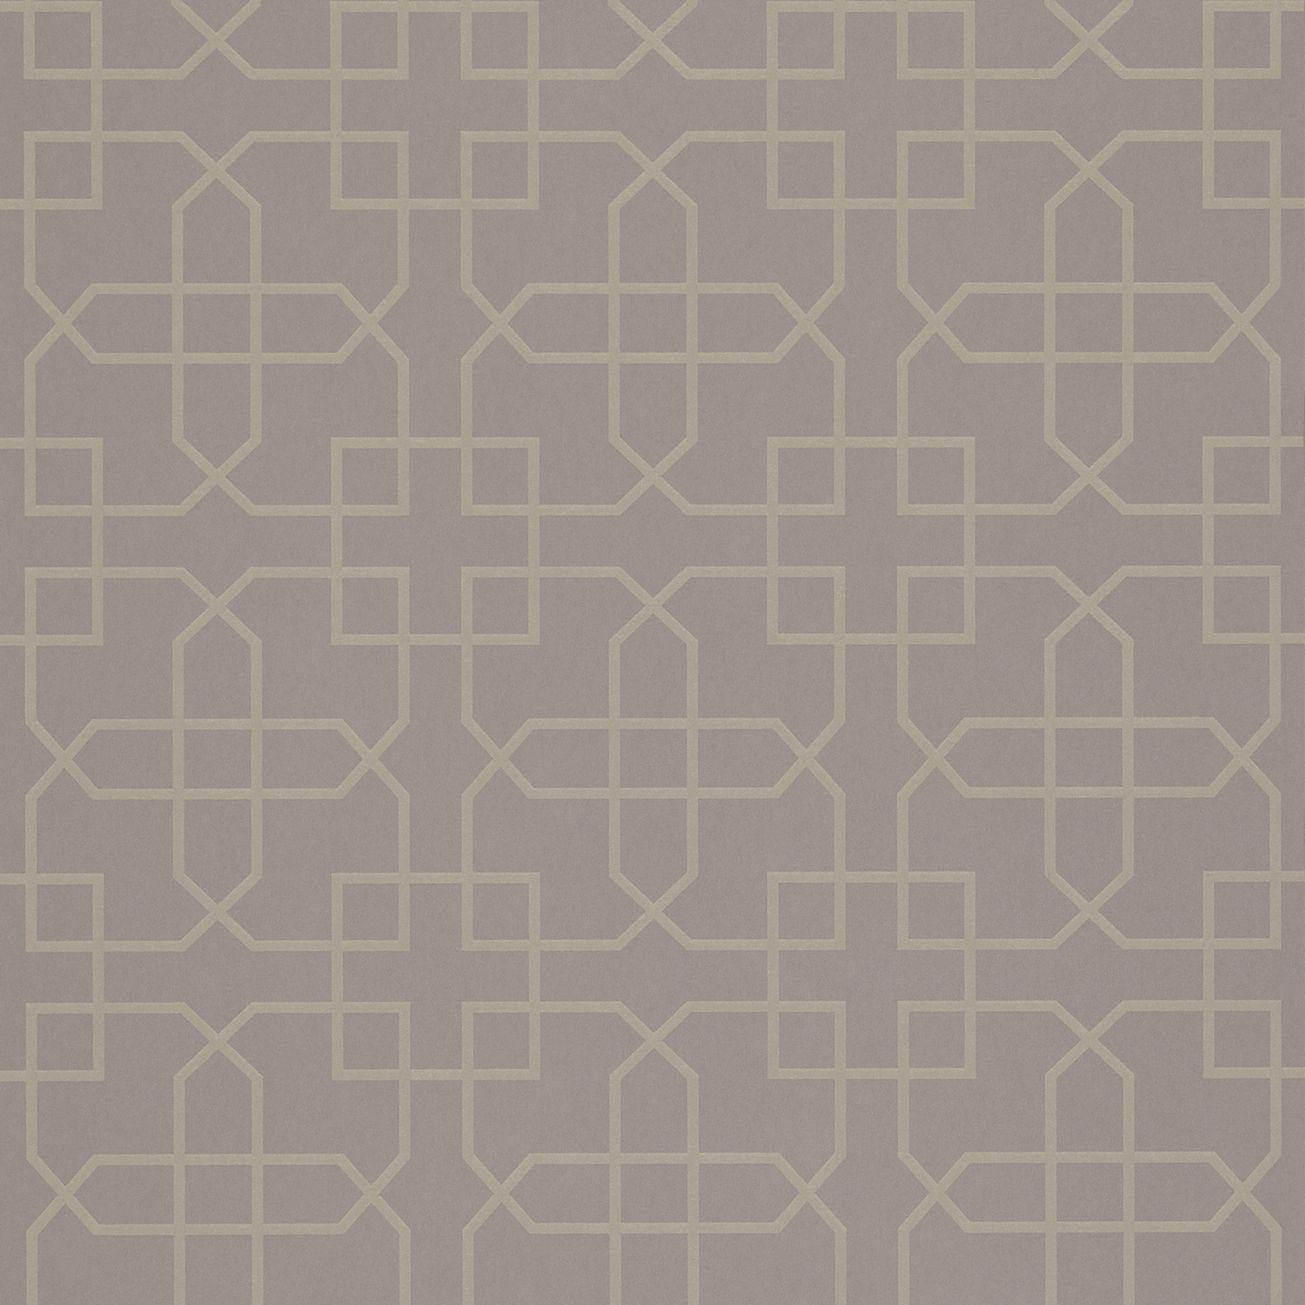 Siam Trellis Wallpaper Option 10 Wallpaper Collection Sanderson 1305x1305